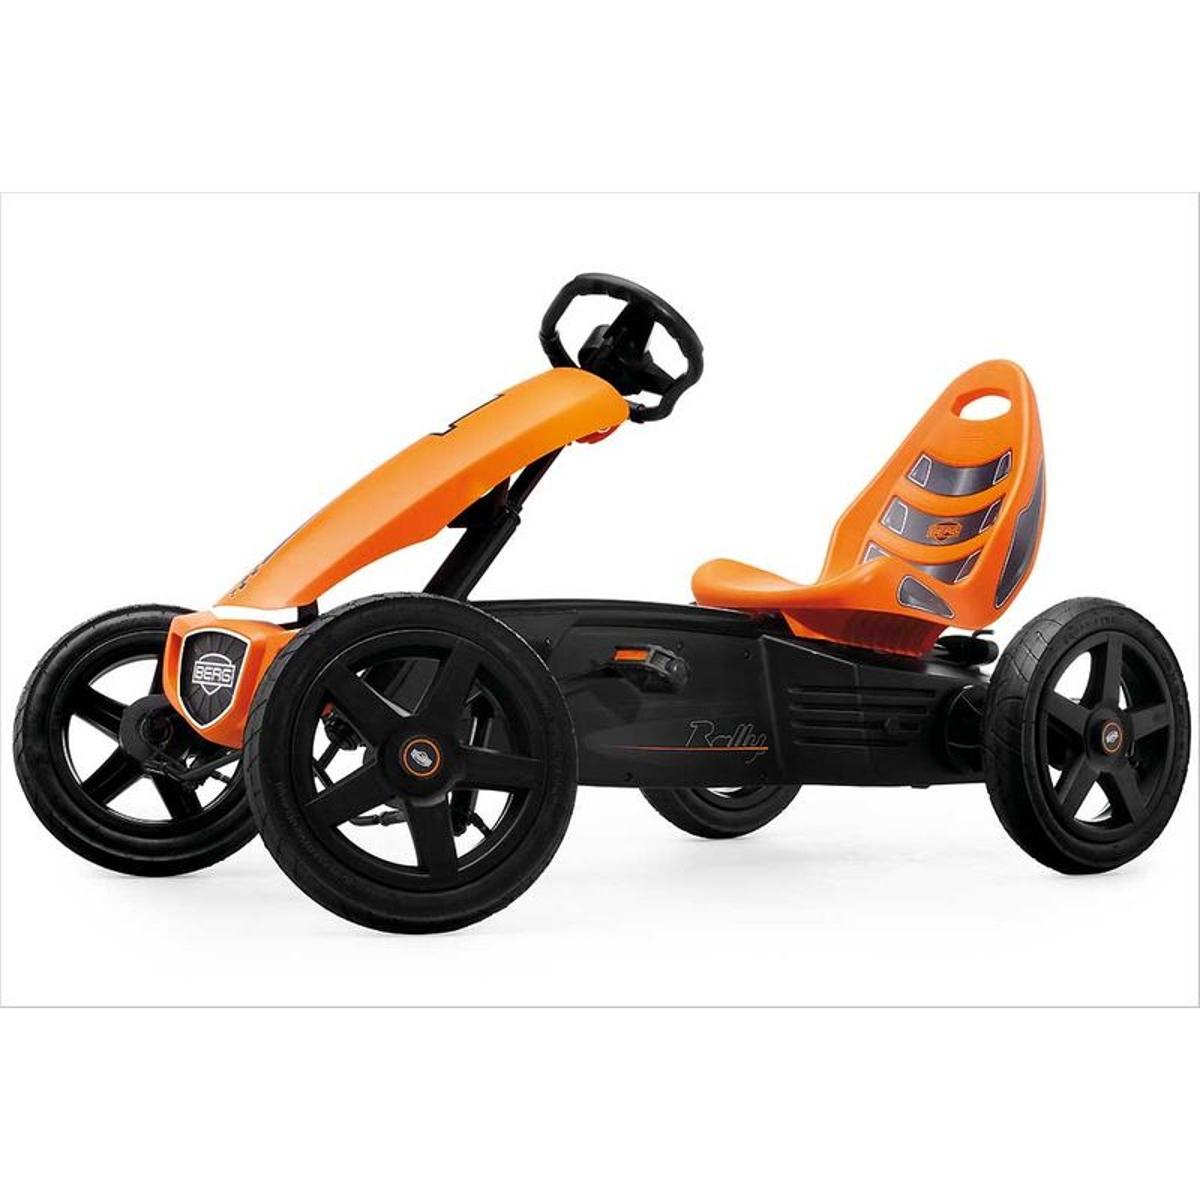 Kart à pédales BERG Rally orange